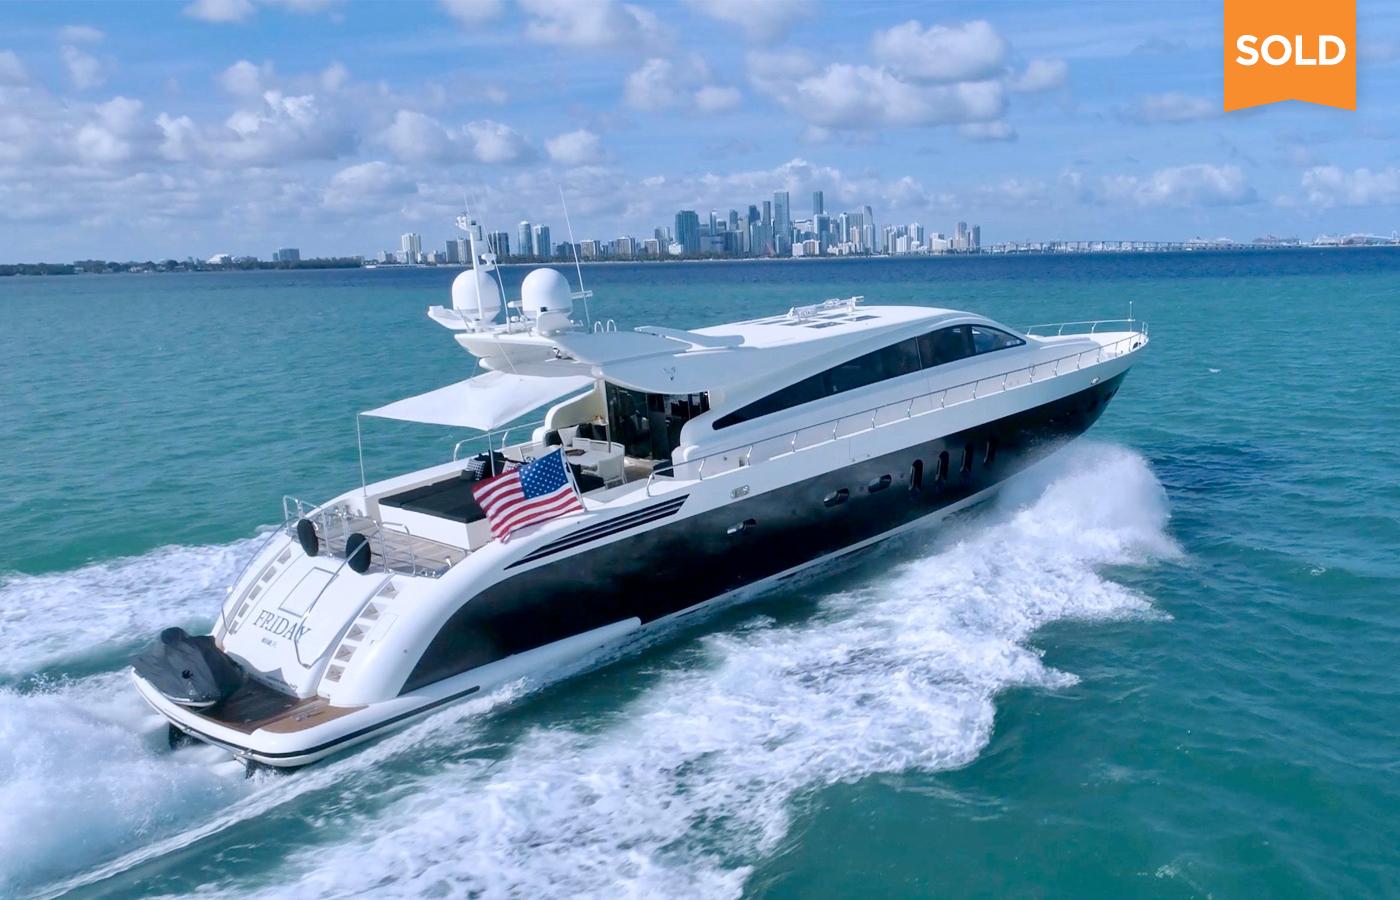 101 Arno Leopard Superyacht Sold By Will Noftsinger